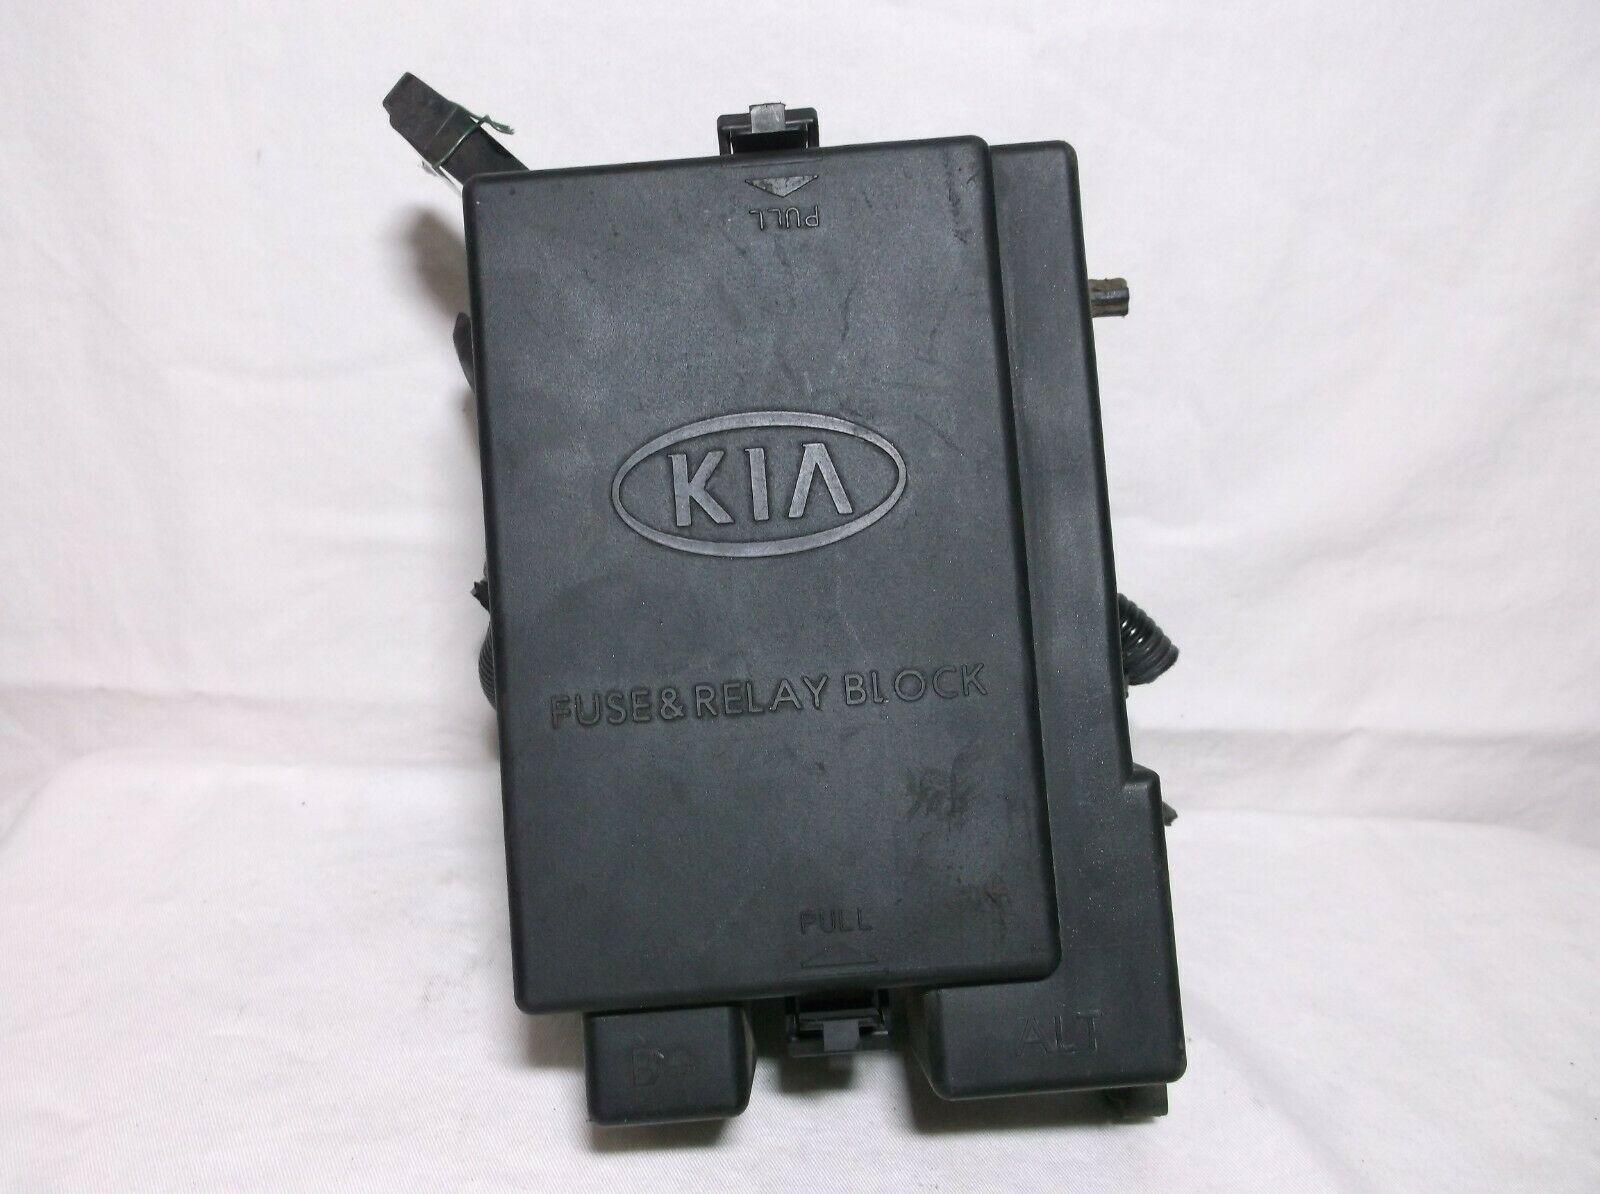 07 08 09 kia spectra engine bay fuse relay box fuses. Black Bedroom Furniture Sets. Home Design Ideas